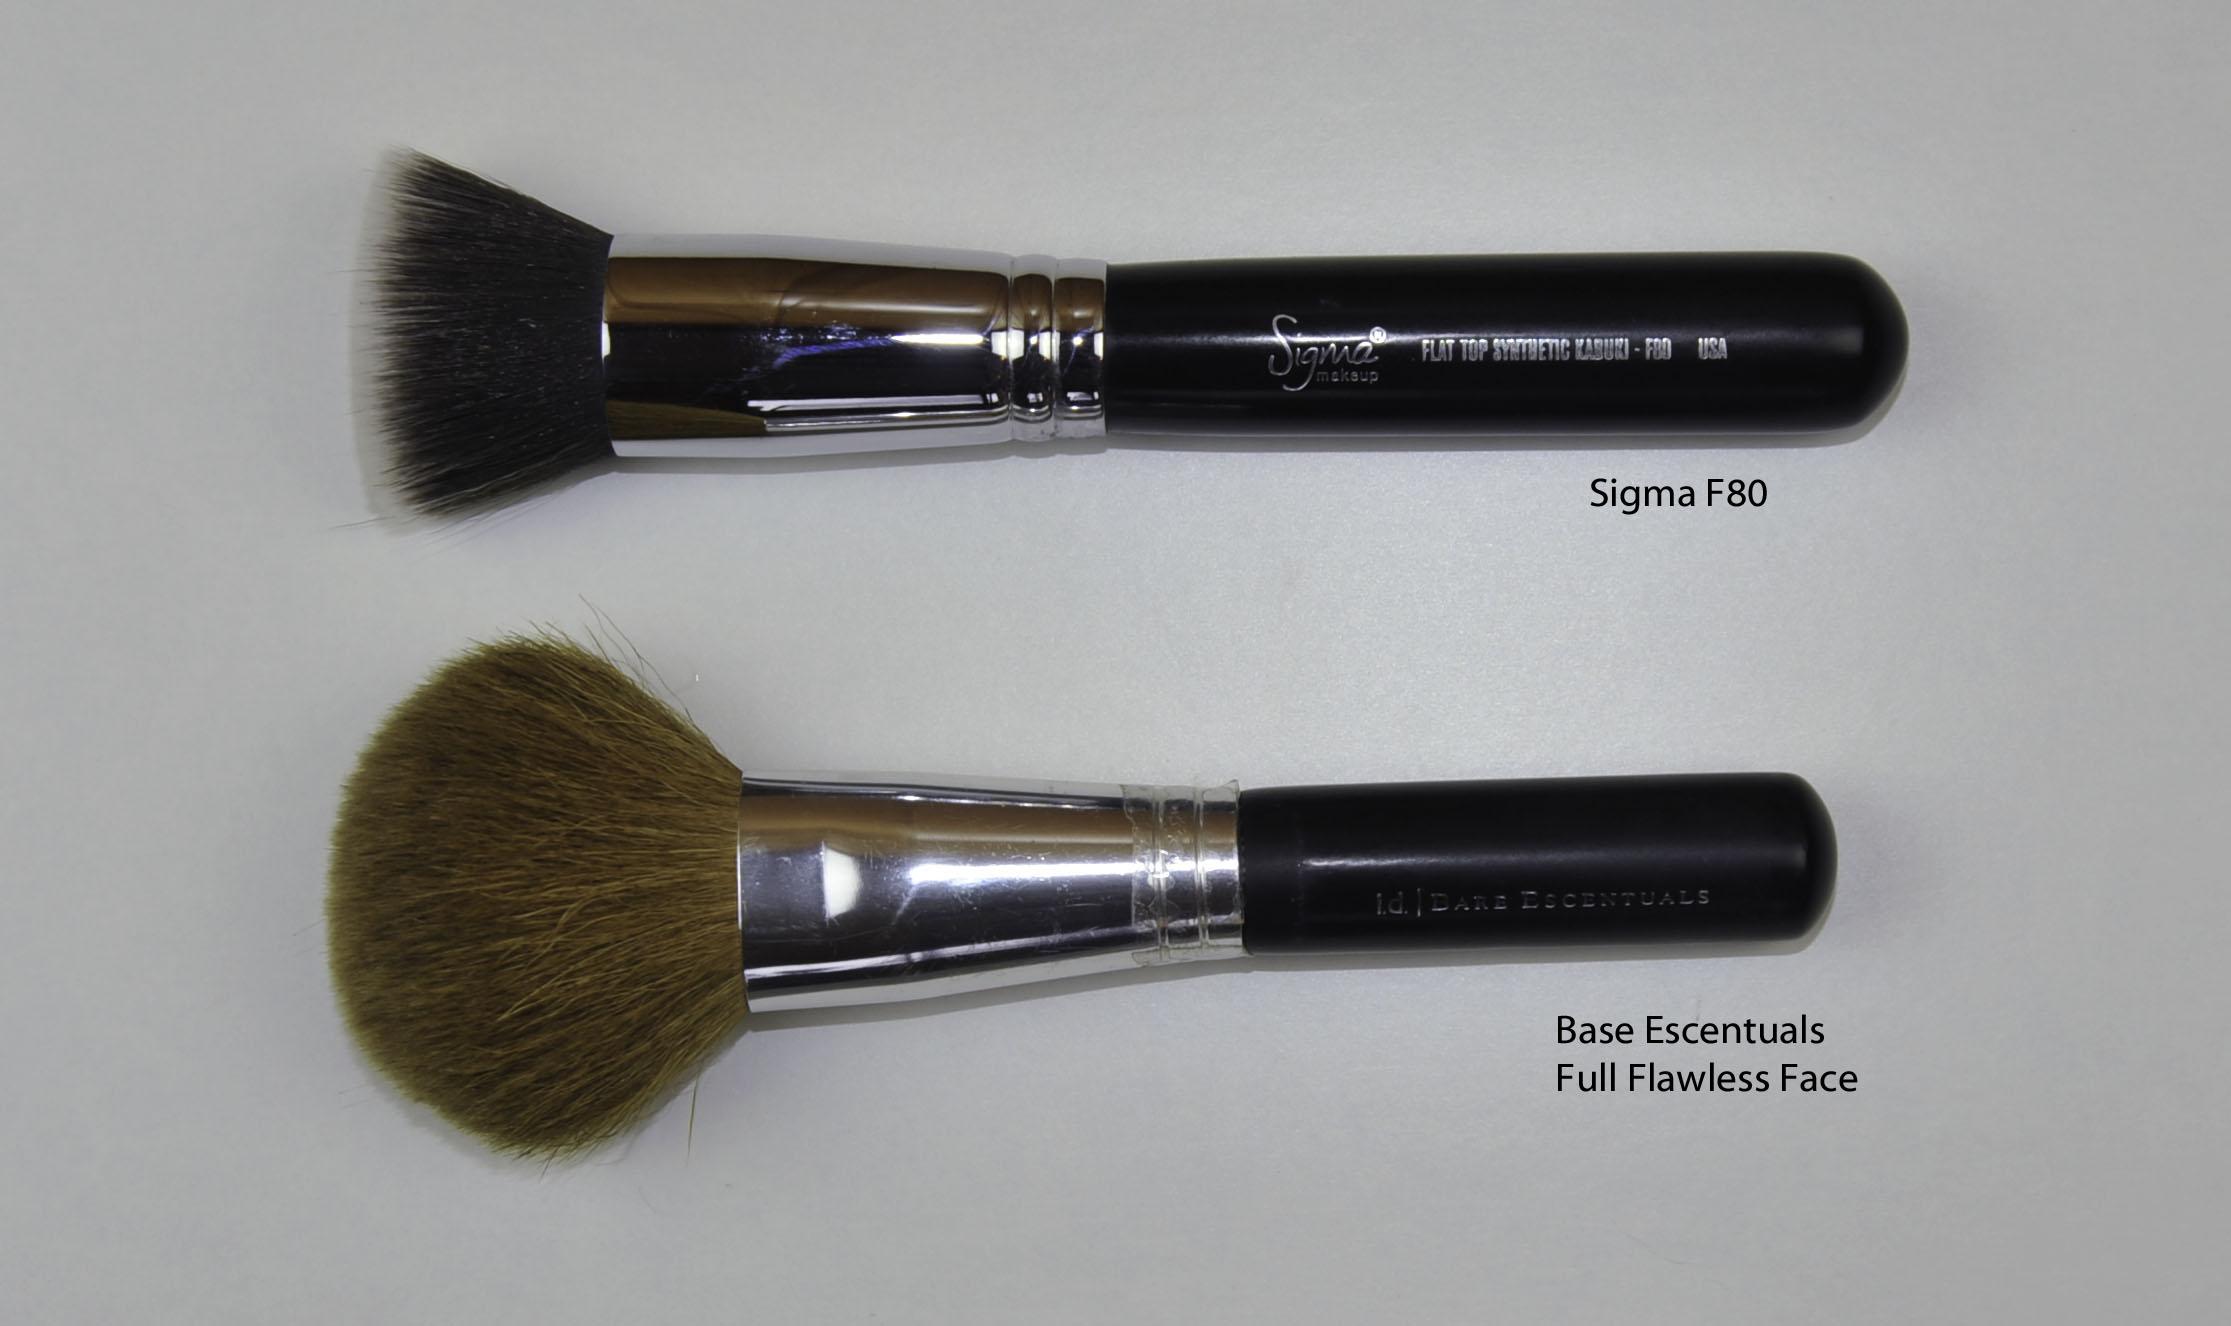 Shu uemura кисти для макияжа